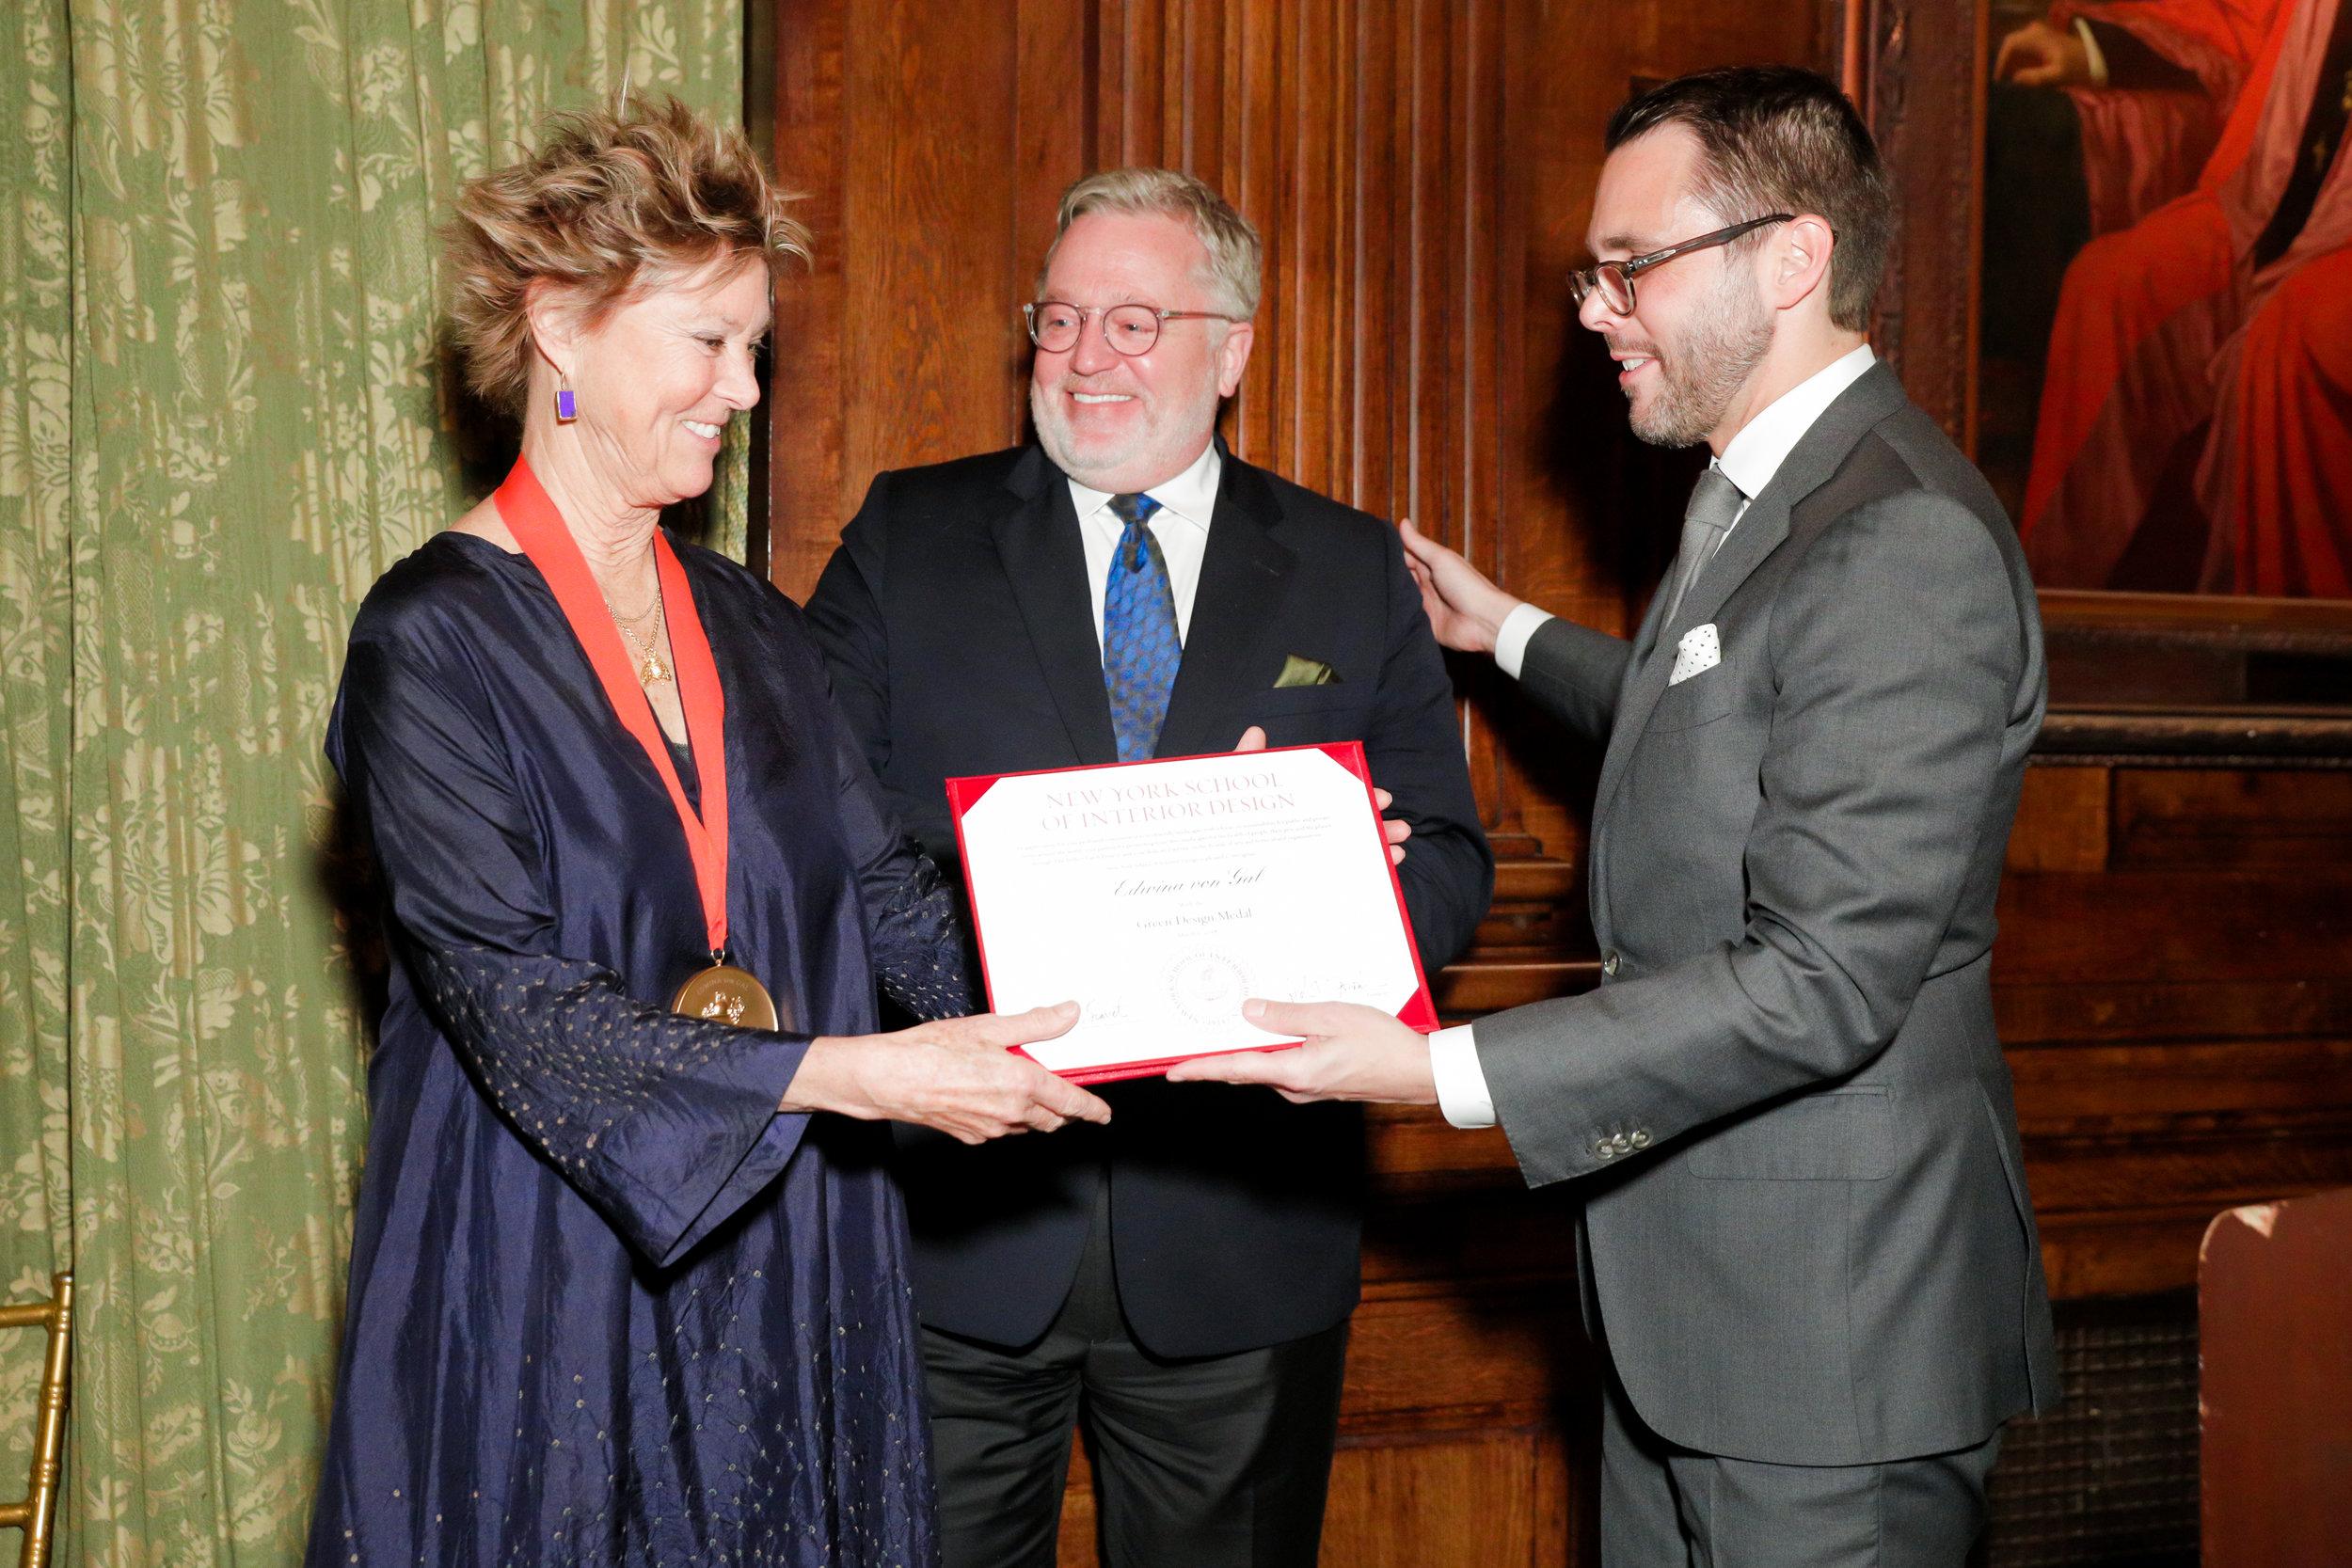 Edwina Von Gal (Honoree), Newell Turner (Gala co-chair/Trustee), David Sprouls